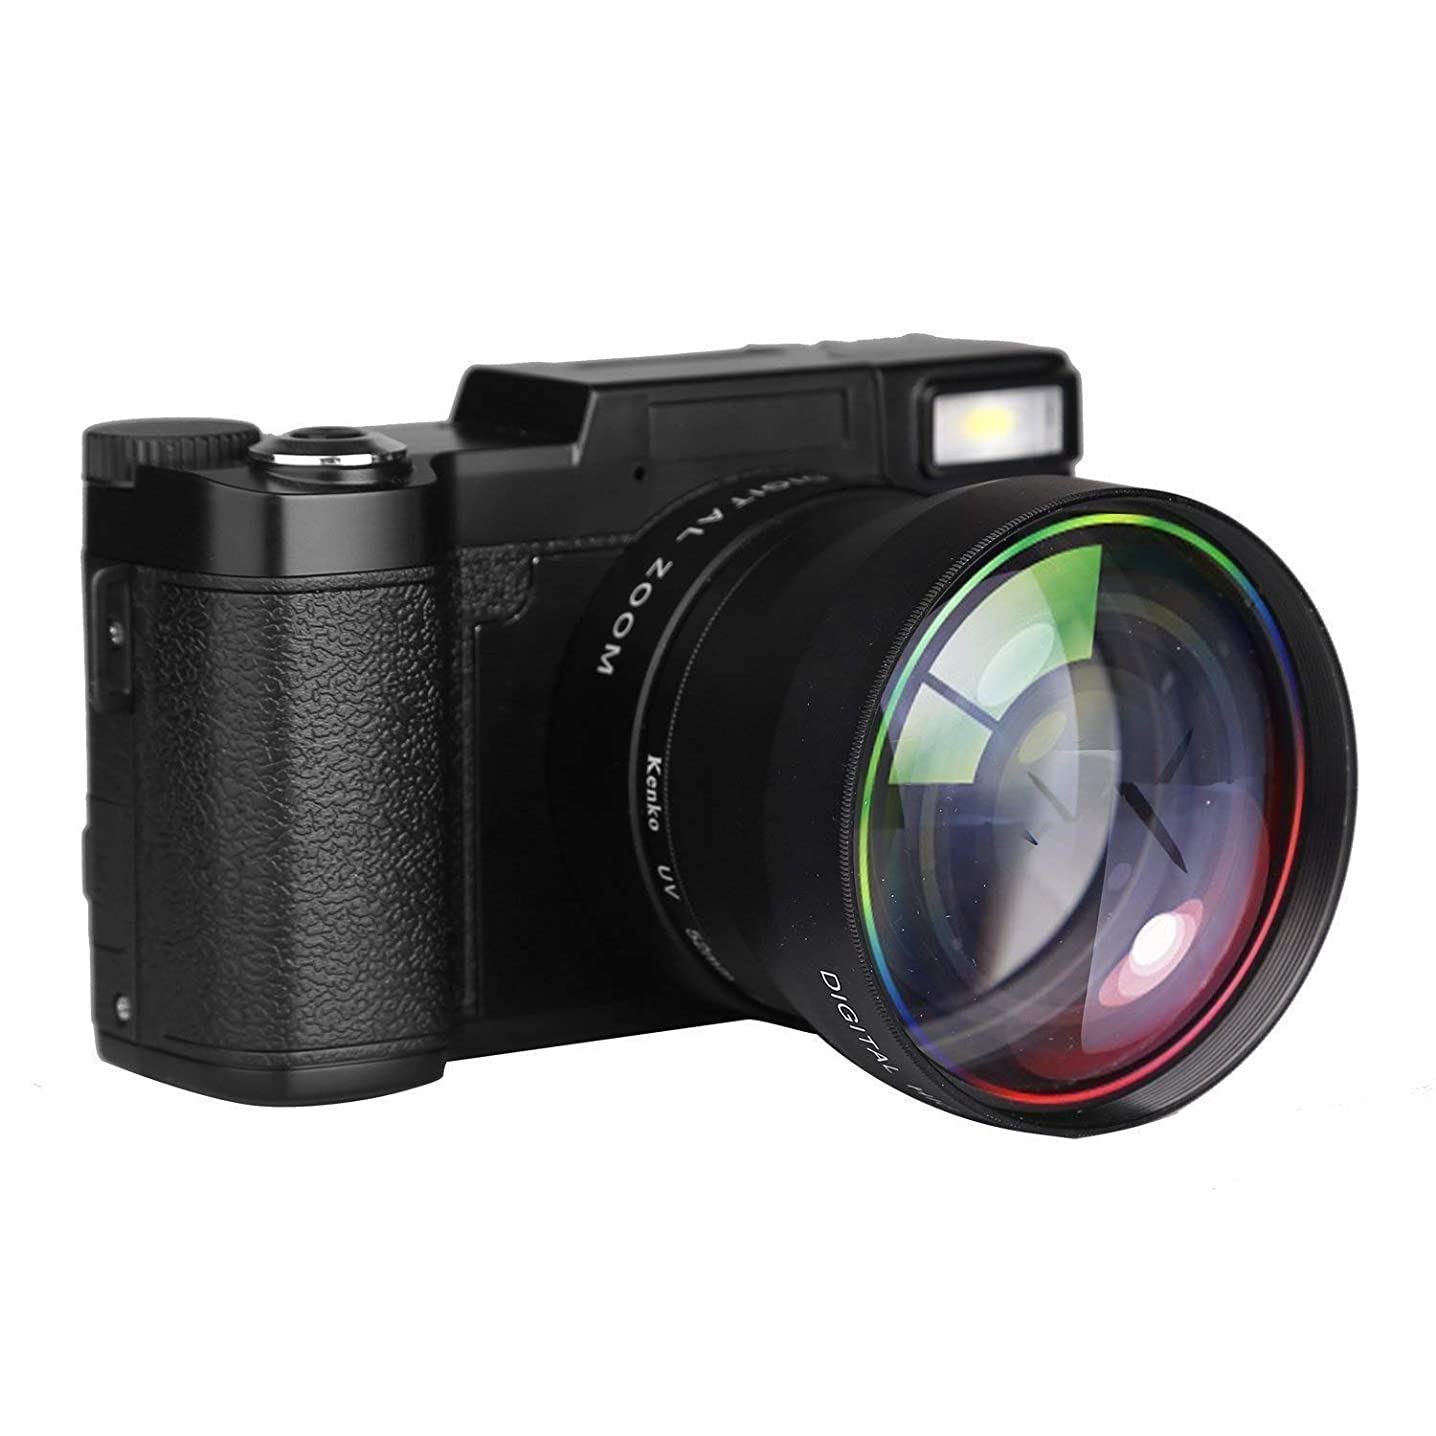 GordVE 3.0 Inch LCD Digital Camera 24 MP Digital Video Camera Camcorder with Night Vision, 16X Digital Zoom Video Camcorder